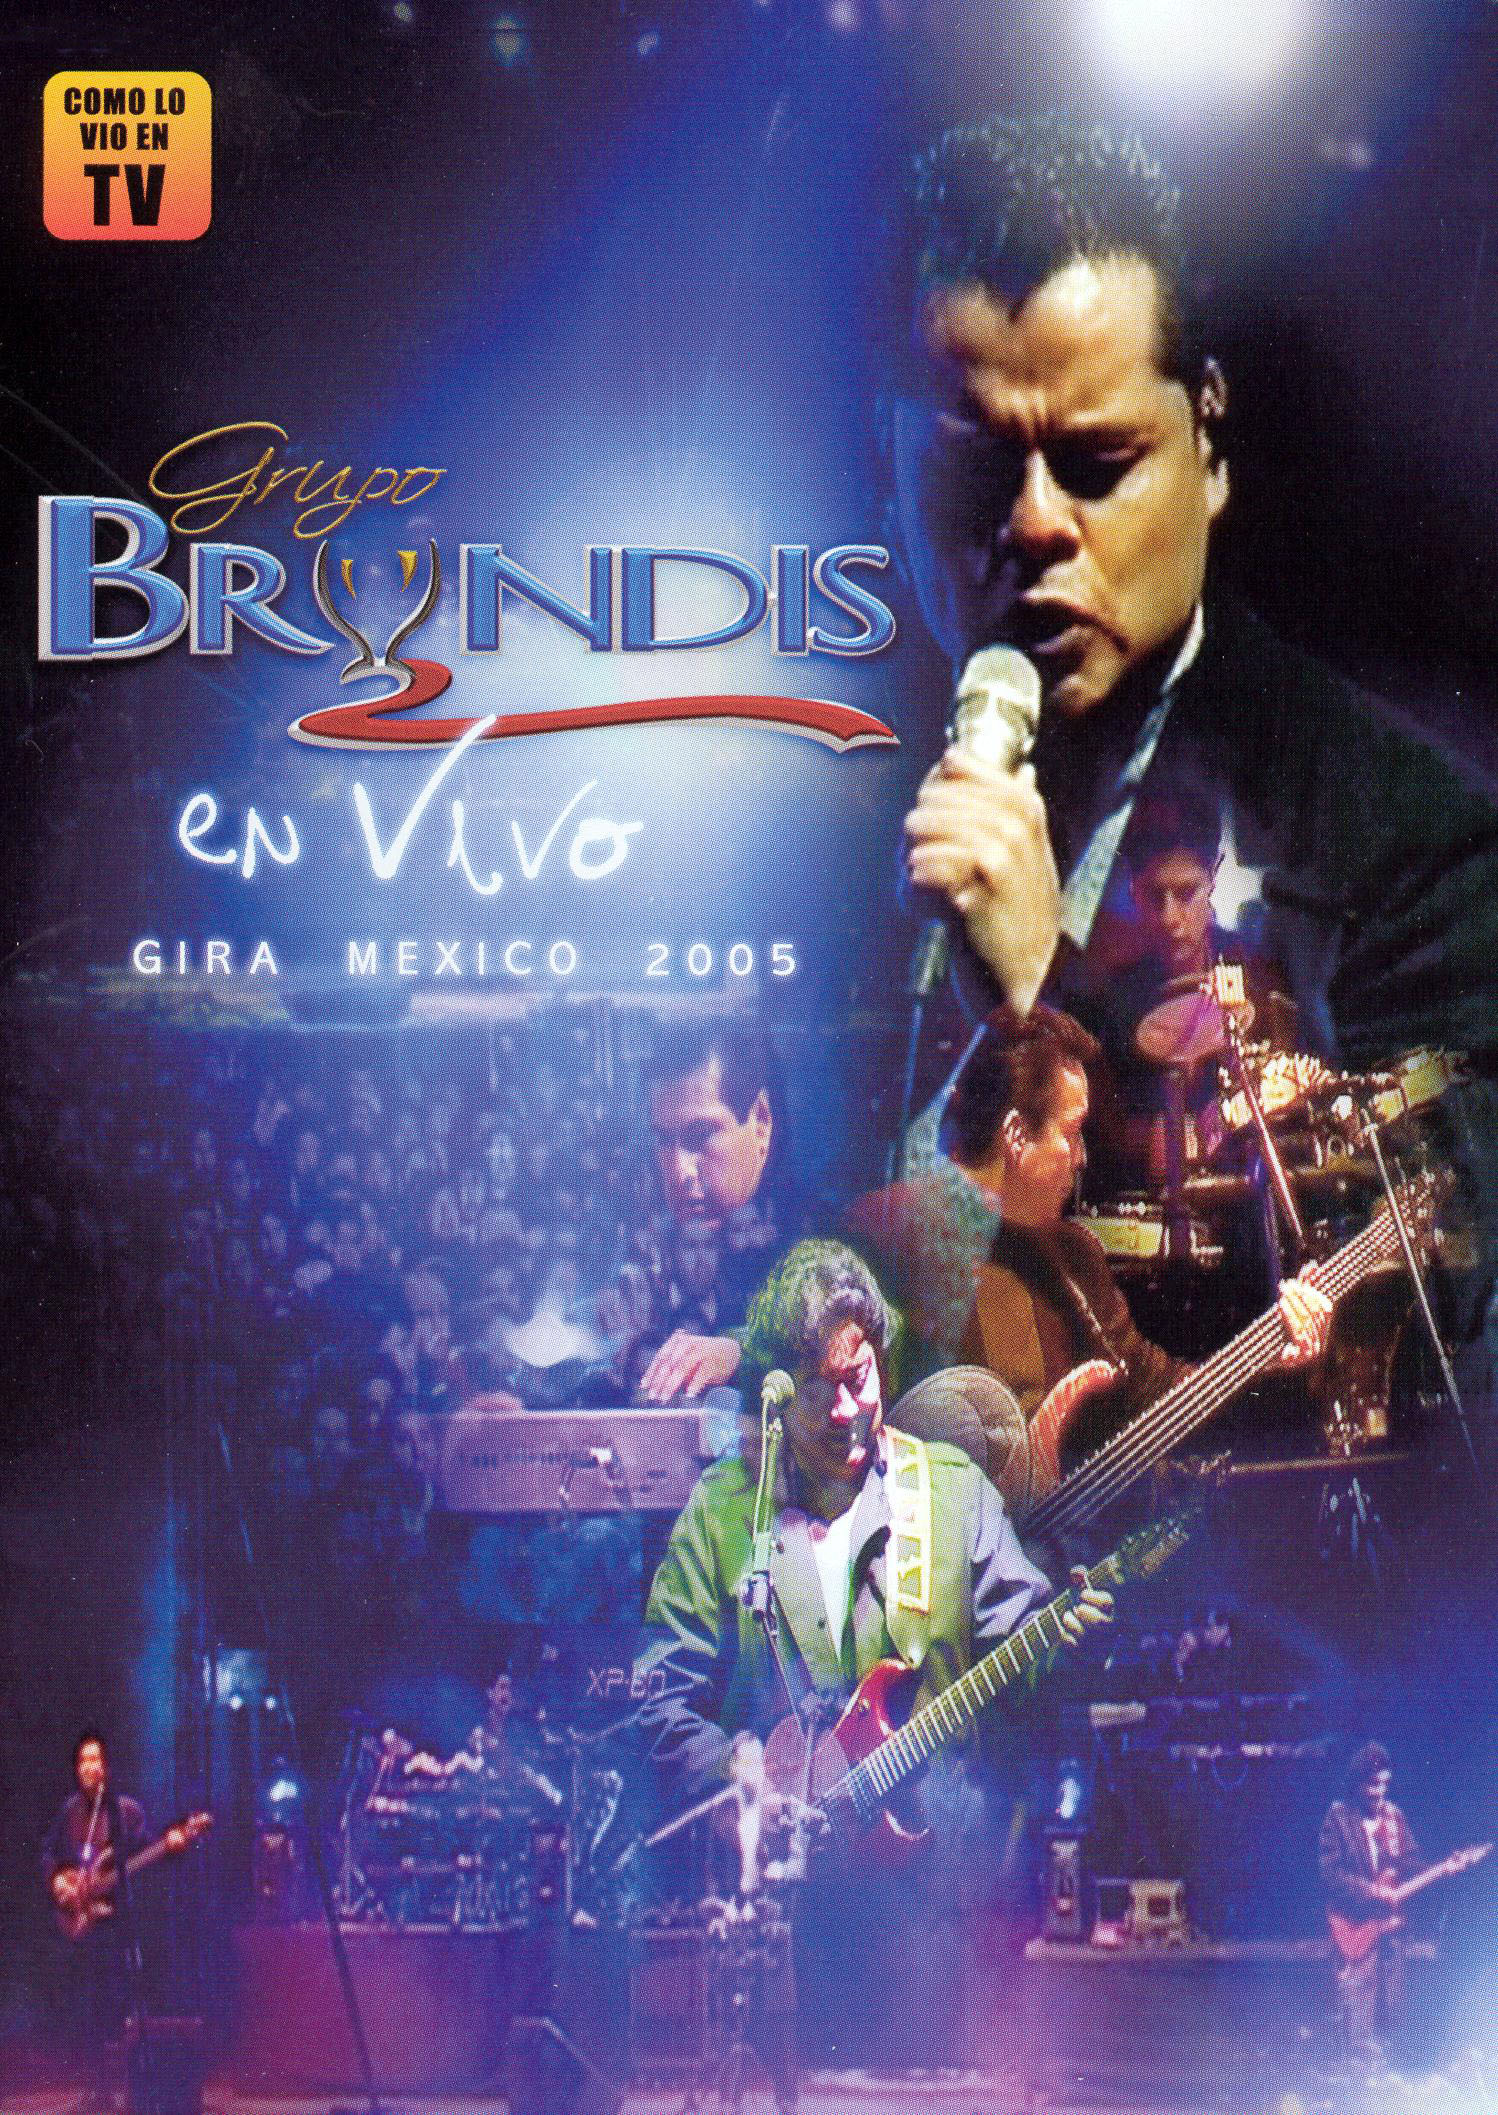 Grupo Bryndis: En Vivo Gira 2005